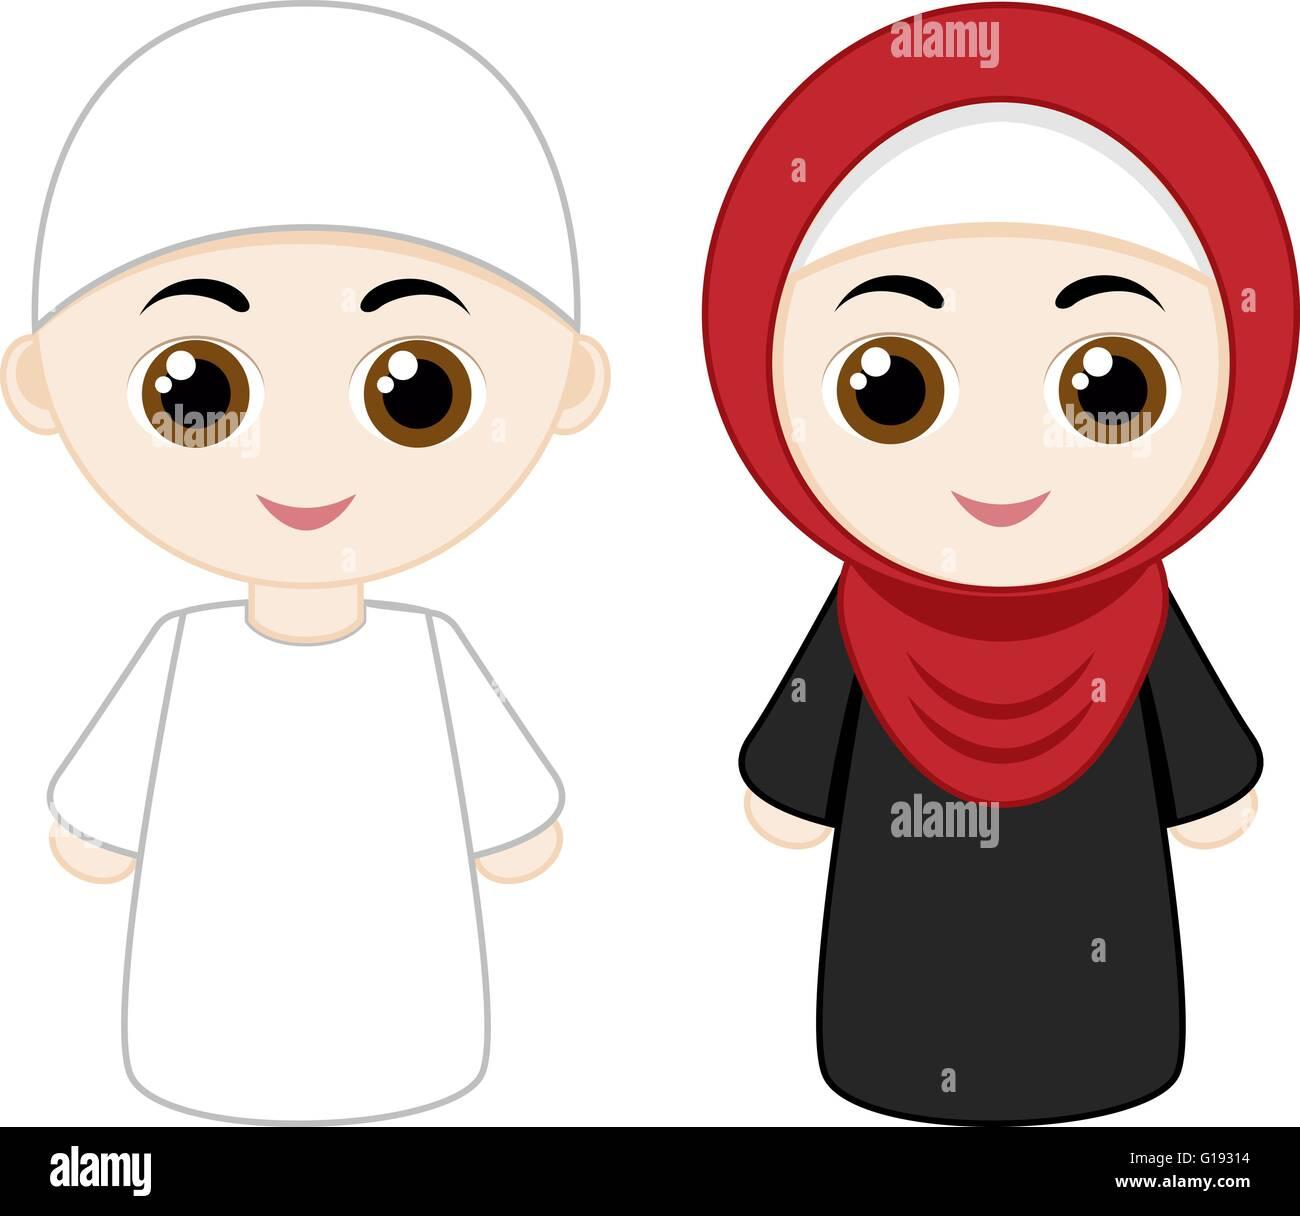 Muslim Love Couples Cartoon Images